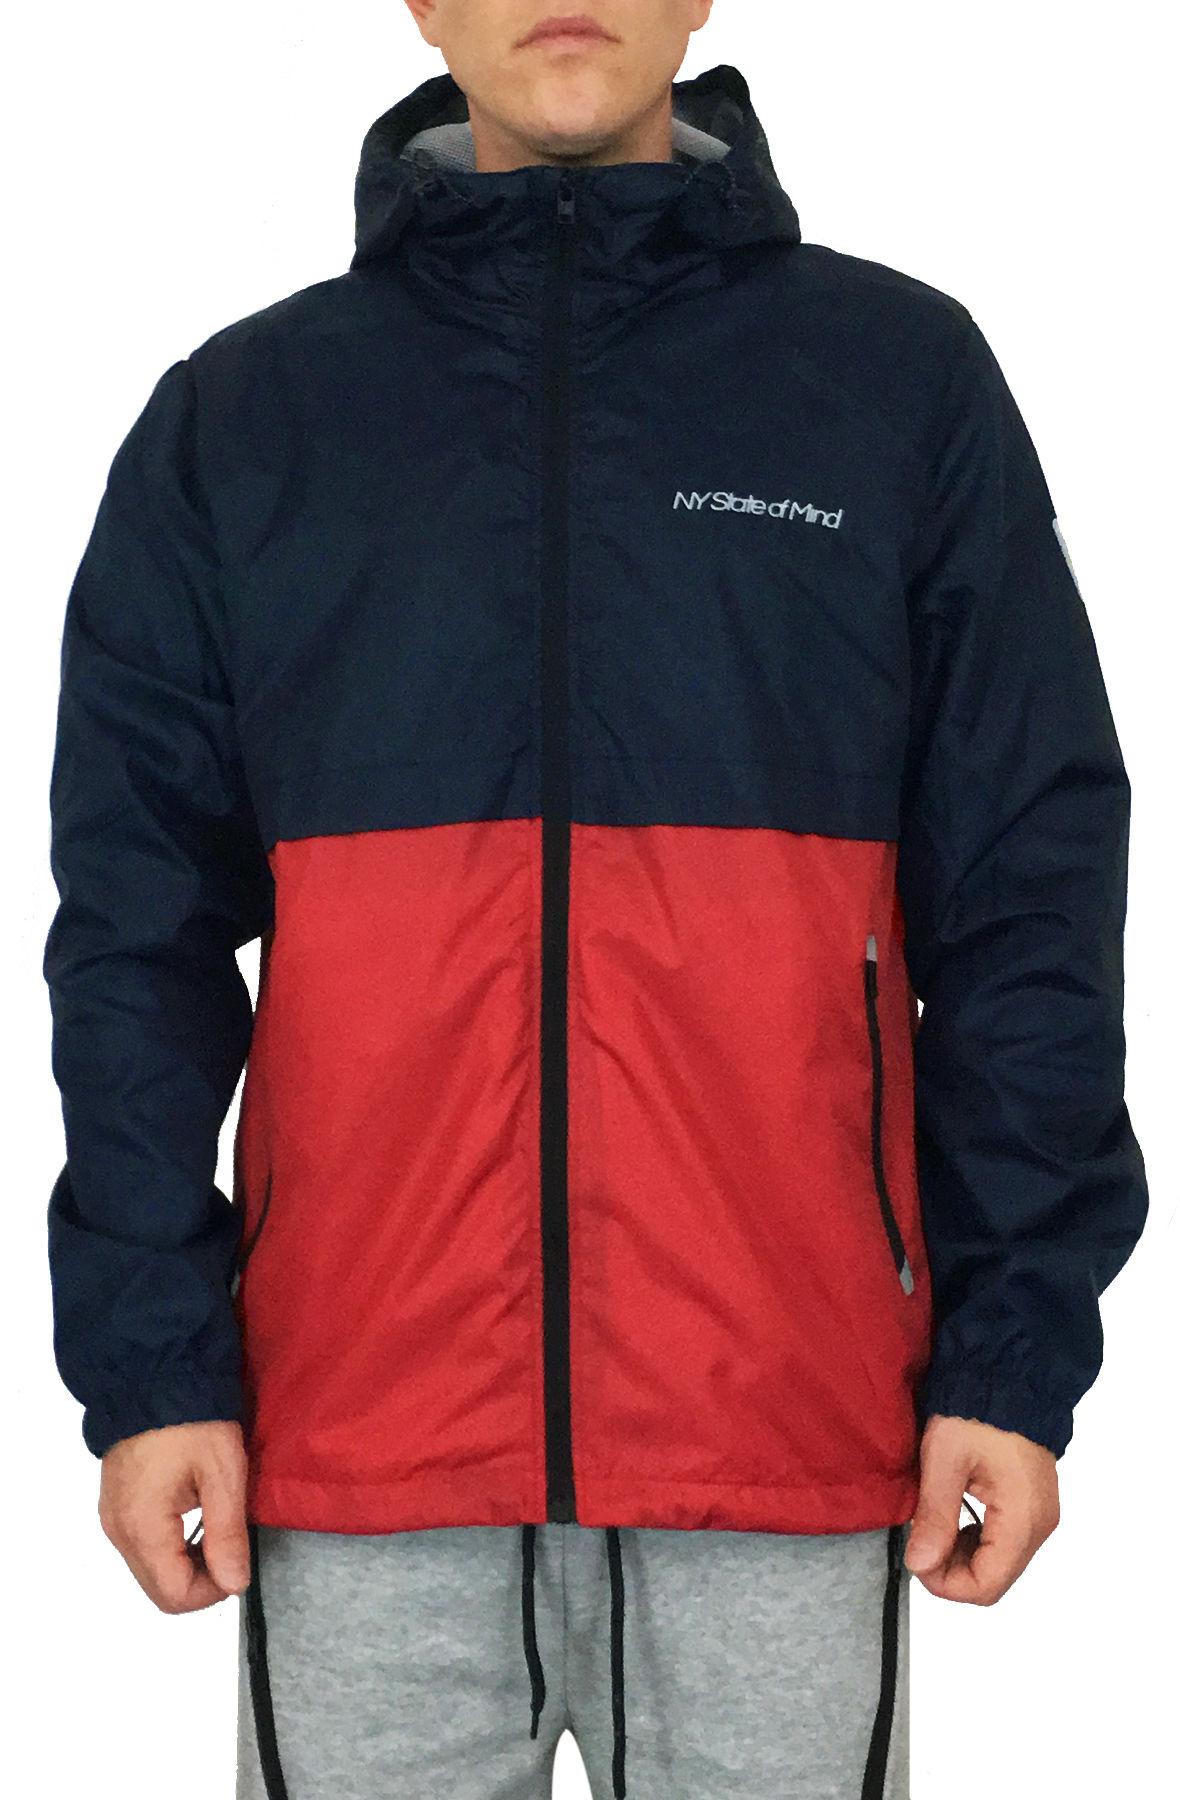 Prospect Jacket